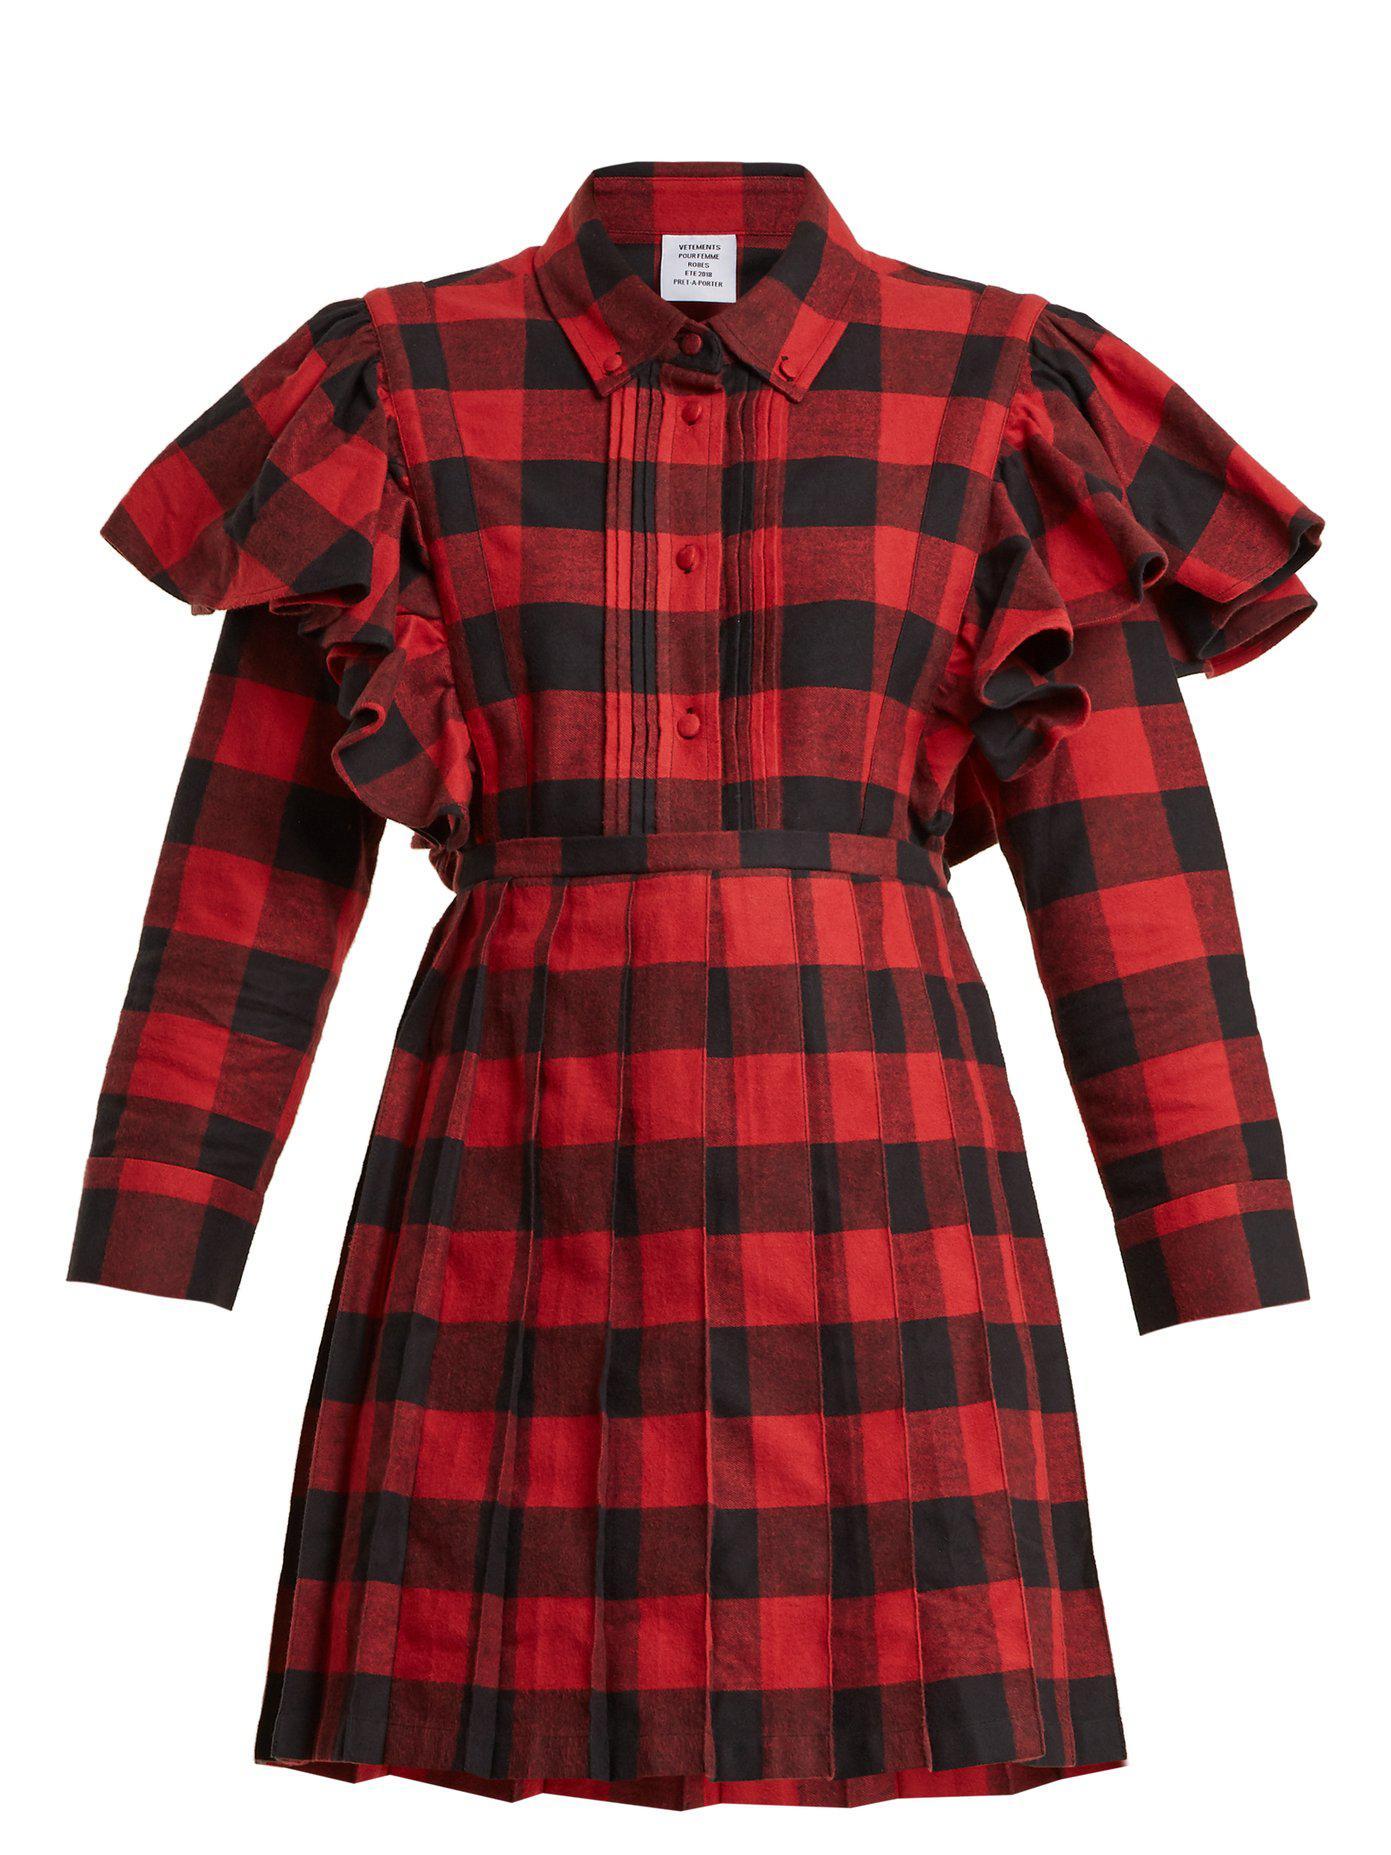 Point-collar checked cotton-flannel dress VETEMENTS sqbM3QQO4